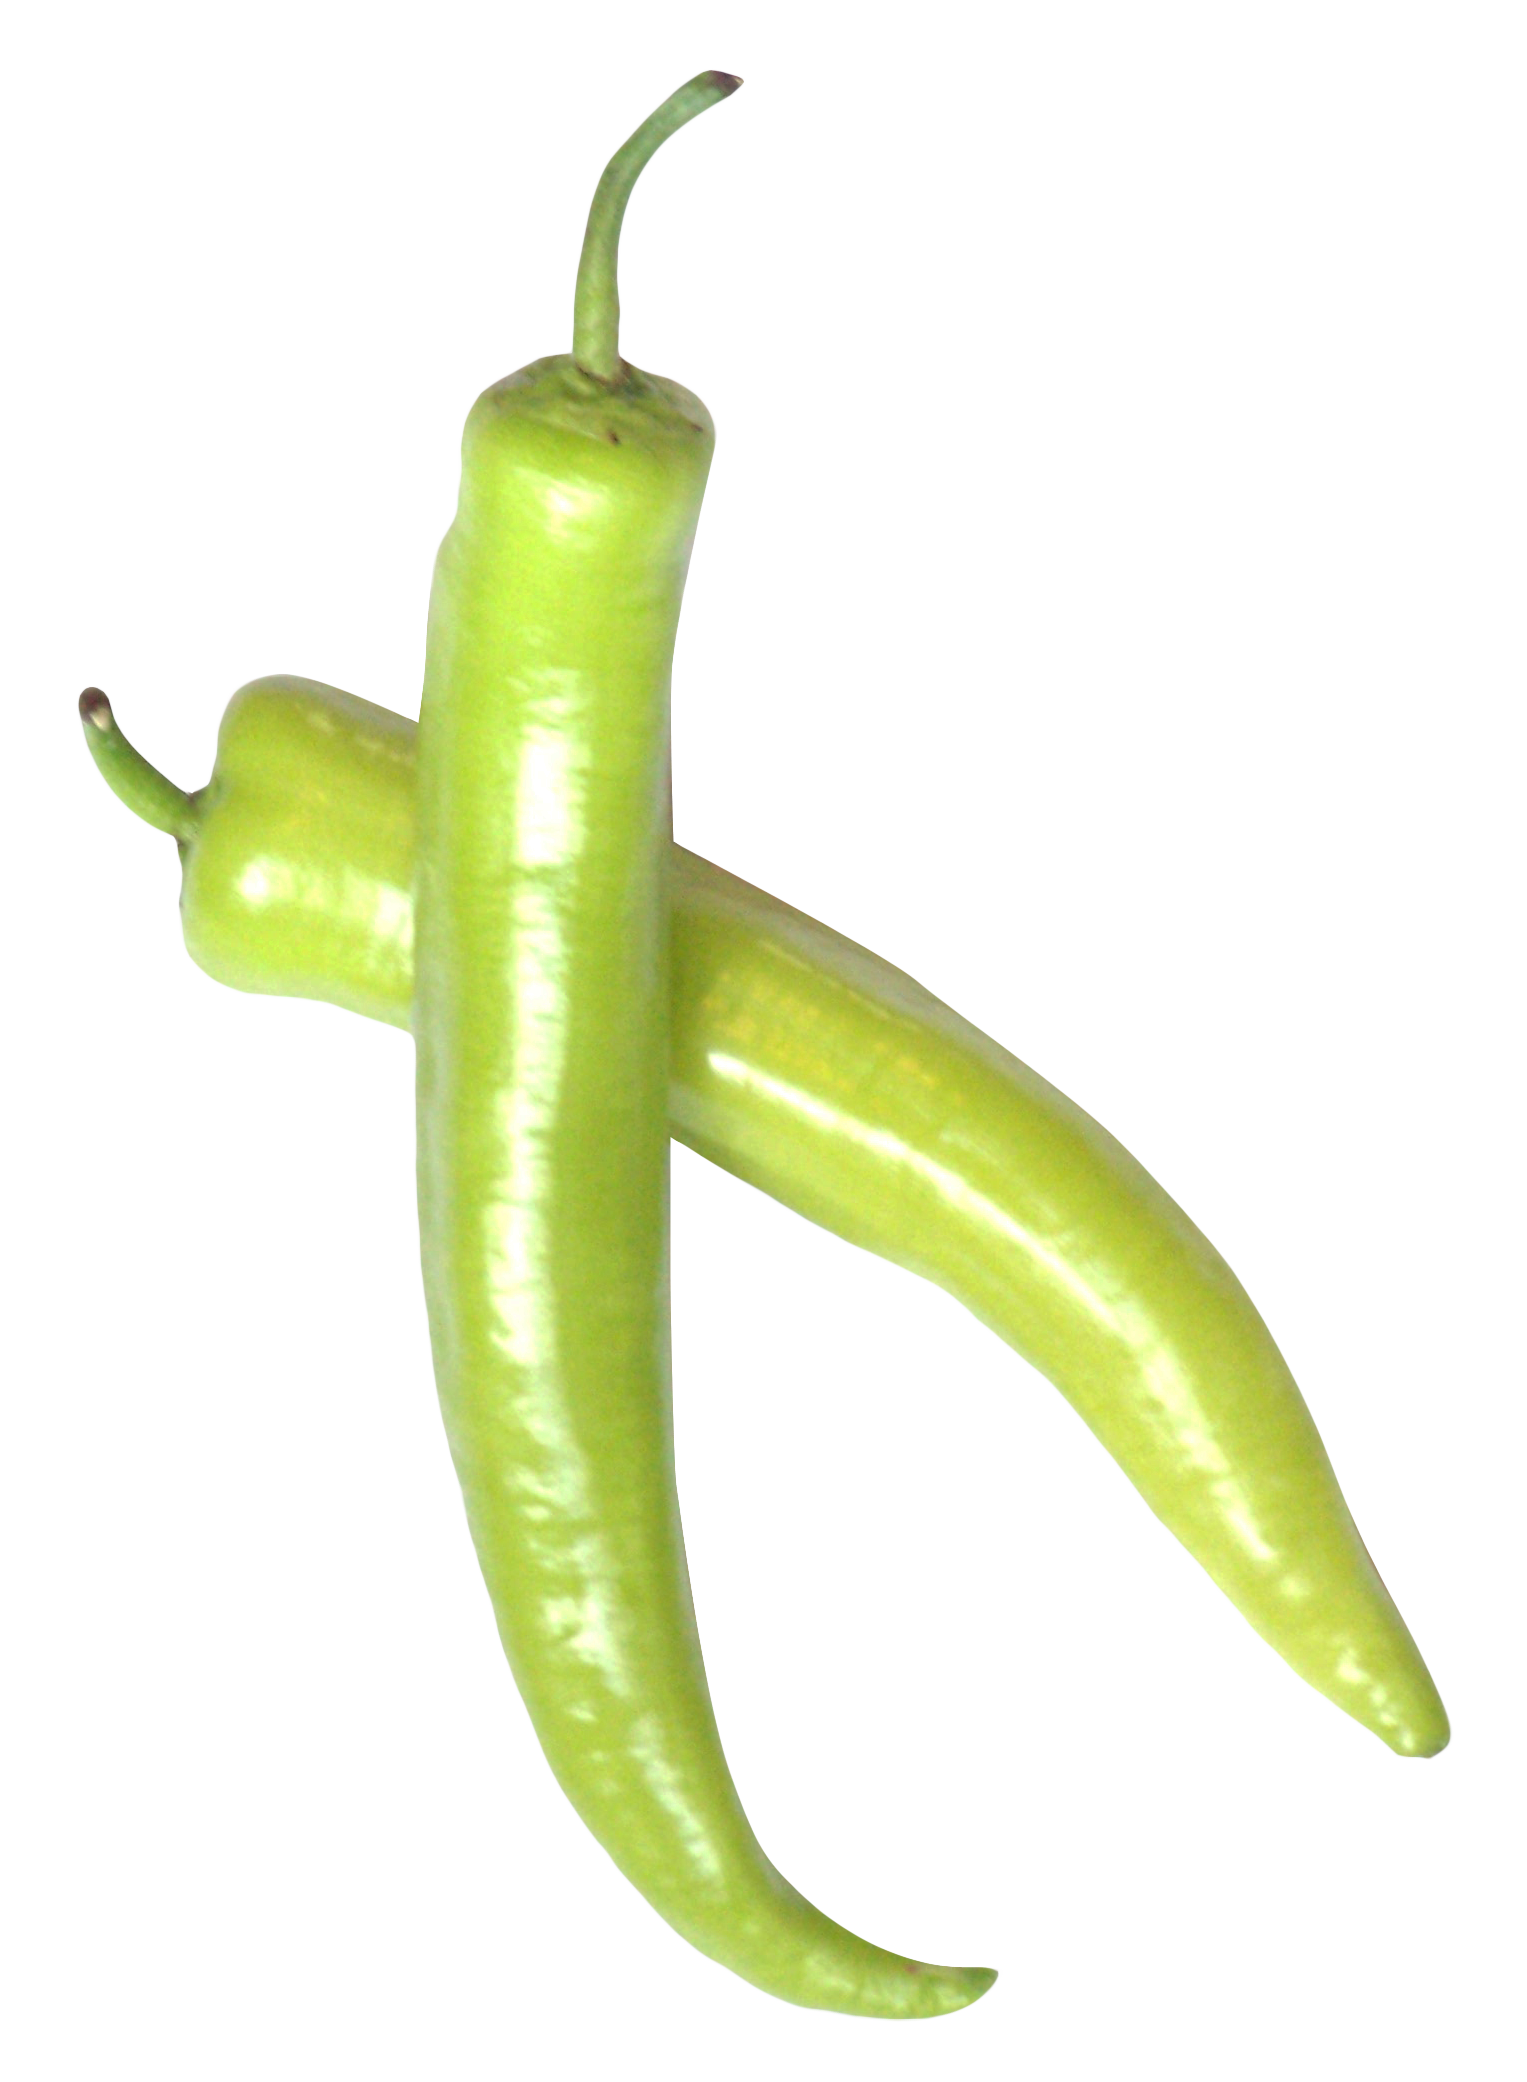 Png images pngpix green. Jalapeno clipart hot pepper